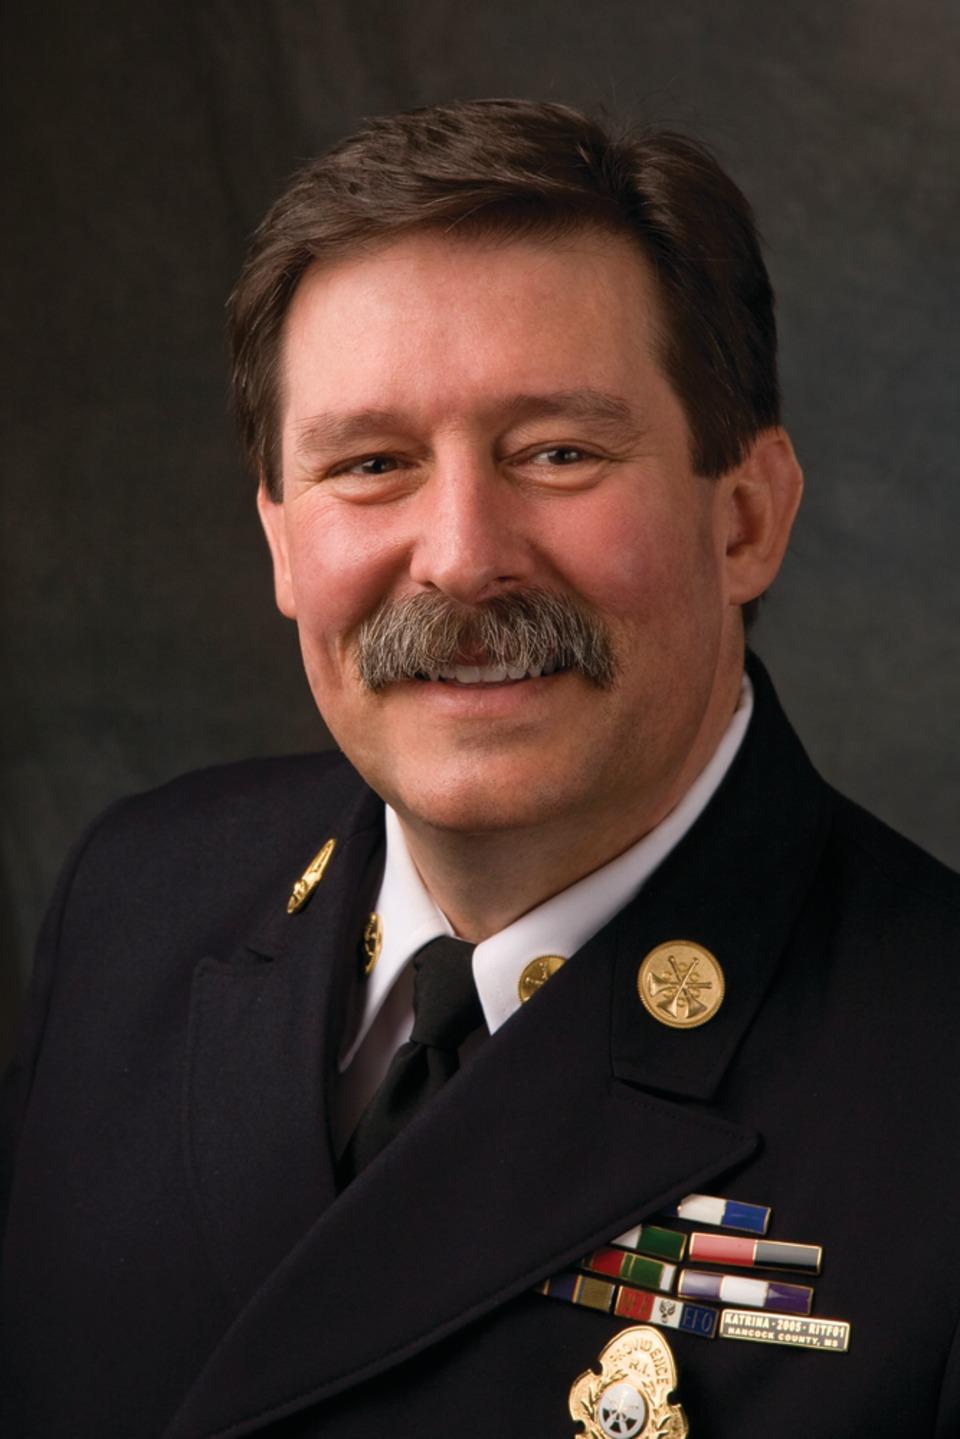 Fire Law: Volunteers Need to Understand the FLSA